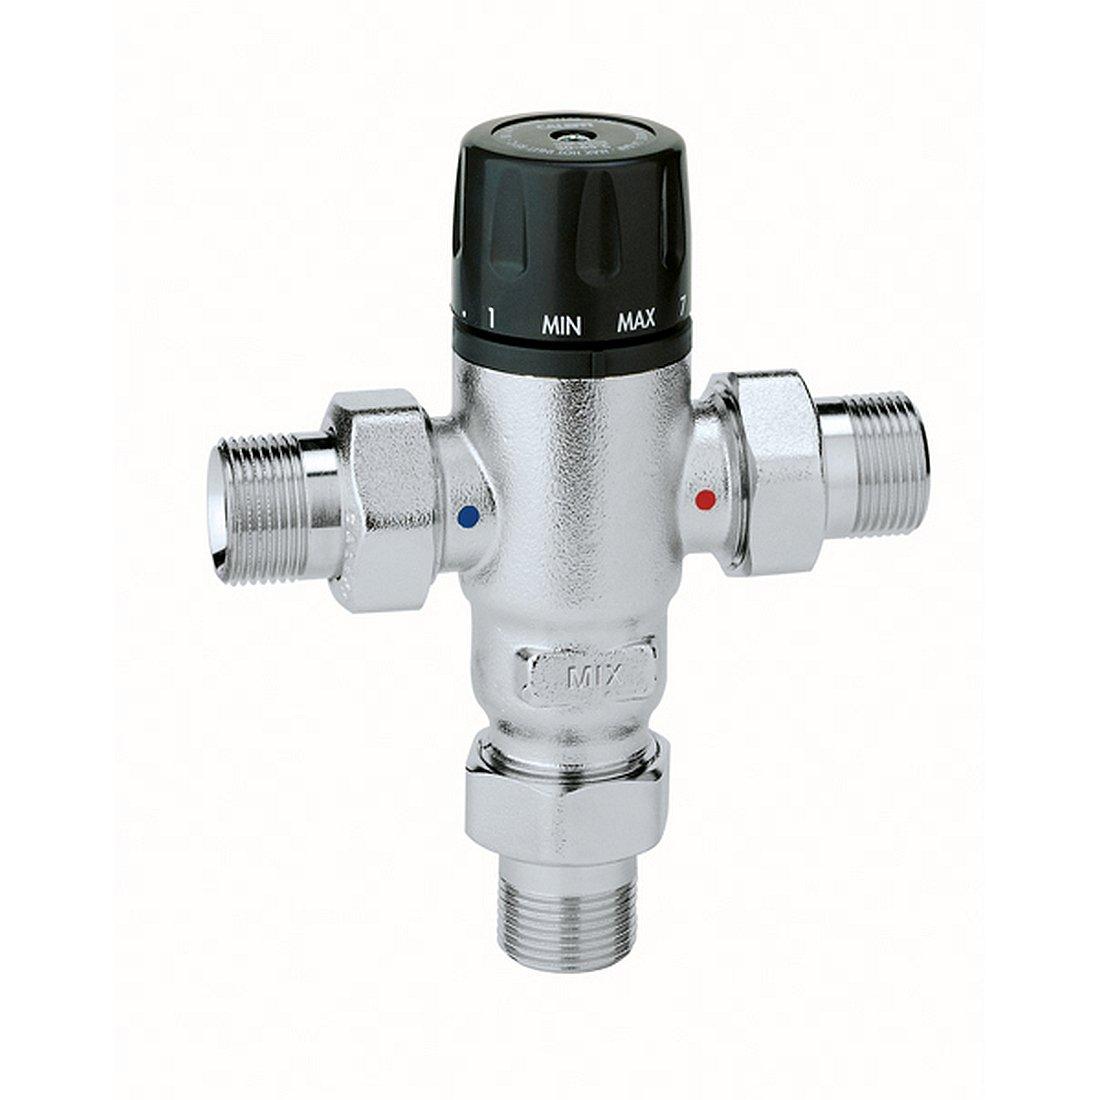 Caleffi 521400 Mezclador Termostá tico Antical 1/2' 30-65 ° C Regulable